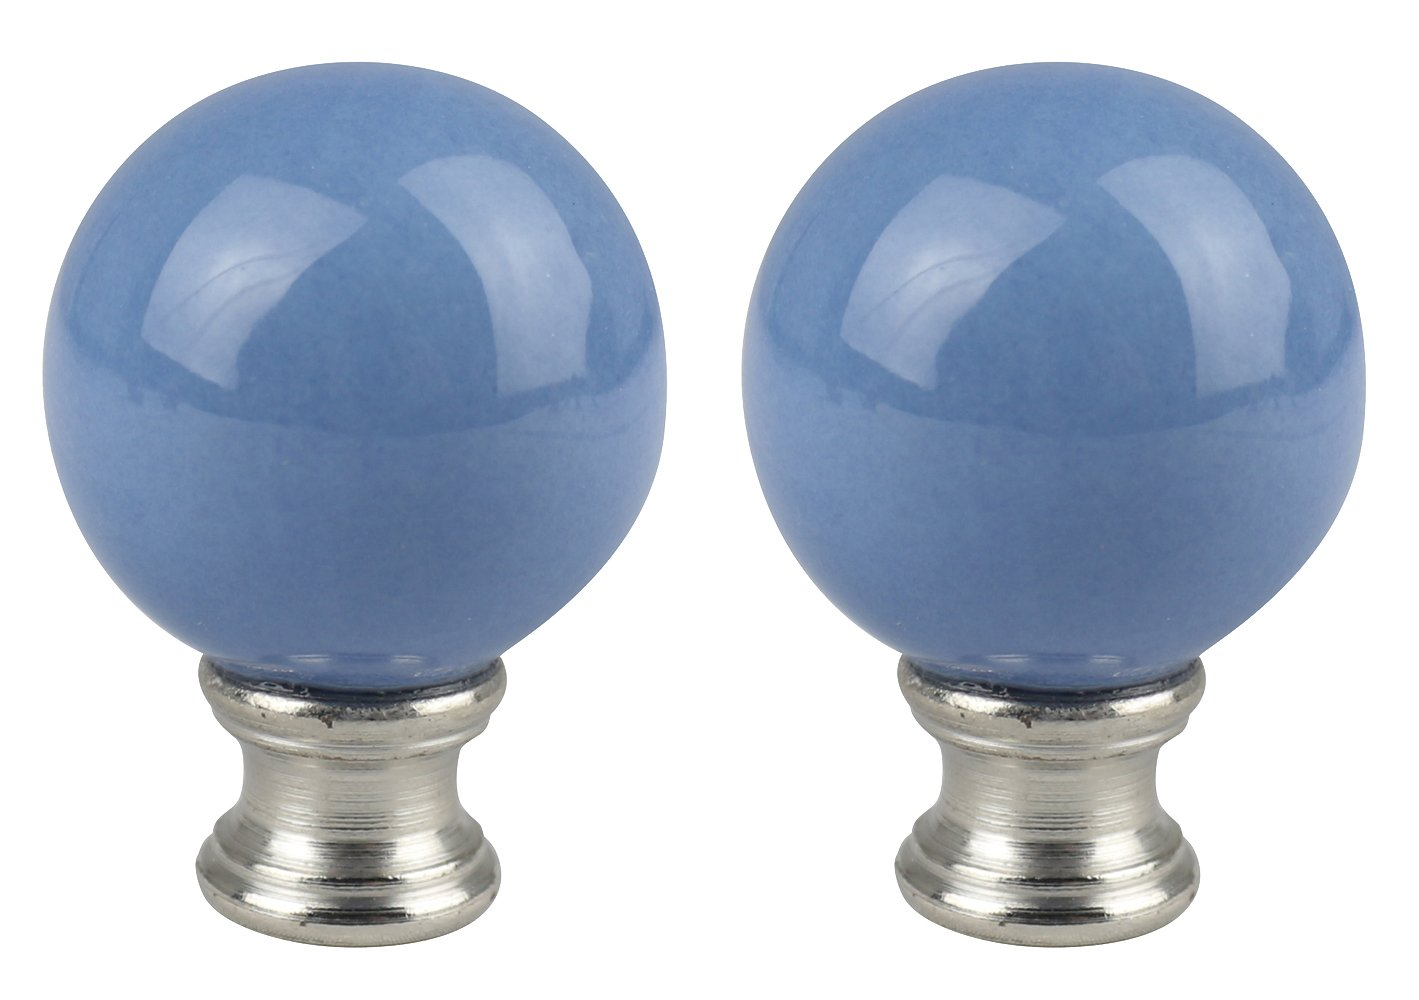 Urbanest Set of 2 Ceramic Ball Lamp Finials, 2-inch Tall, Light Blue